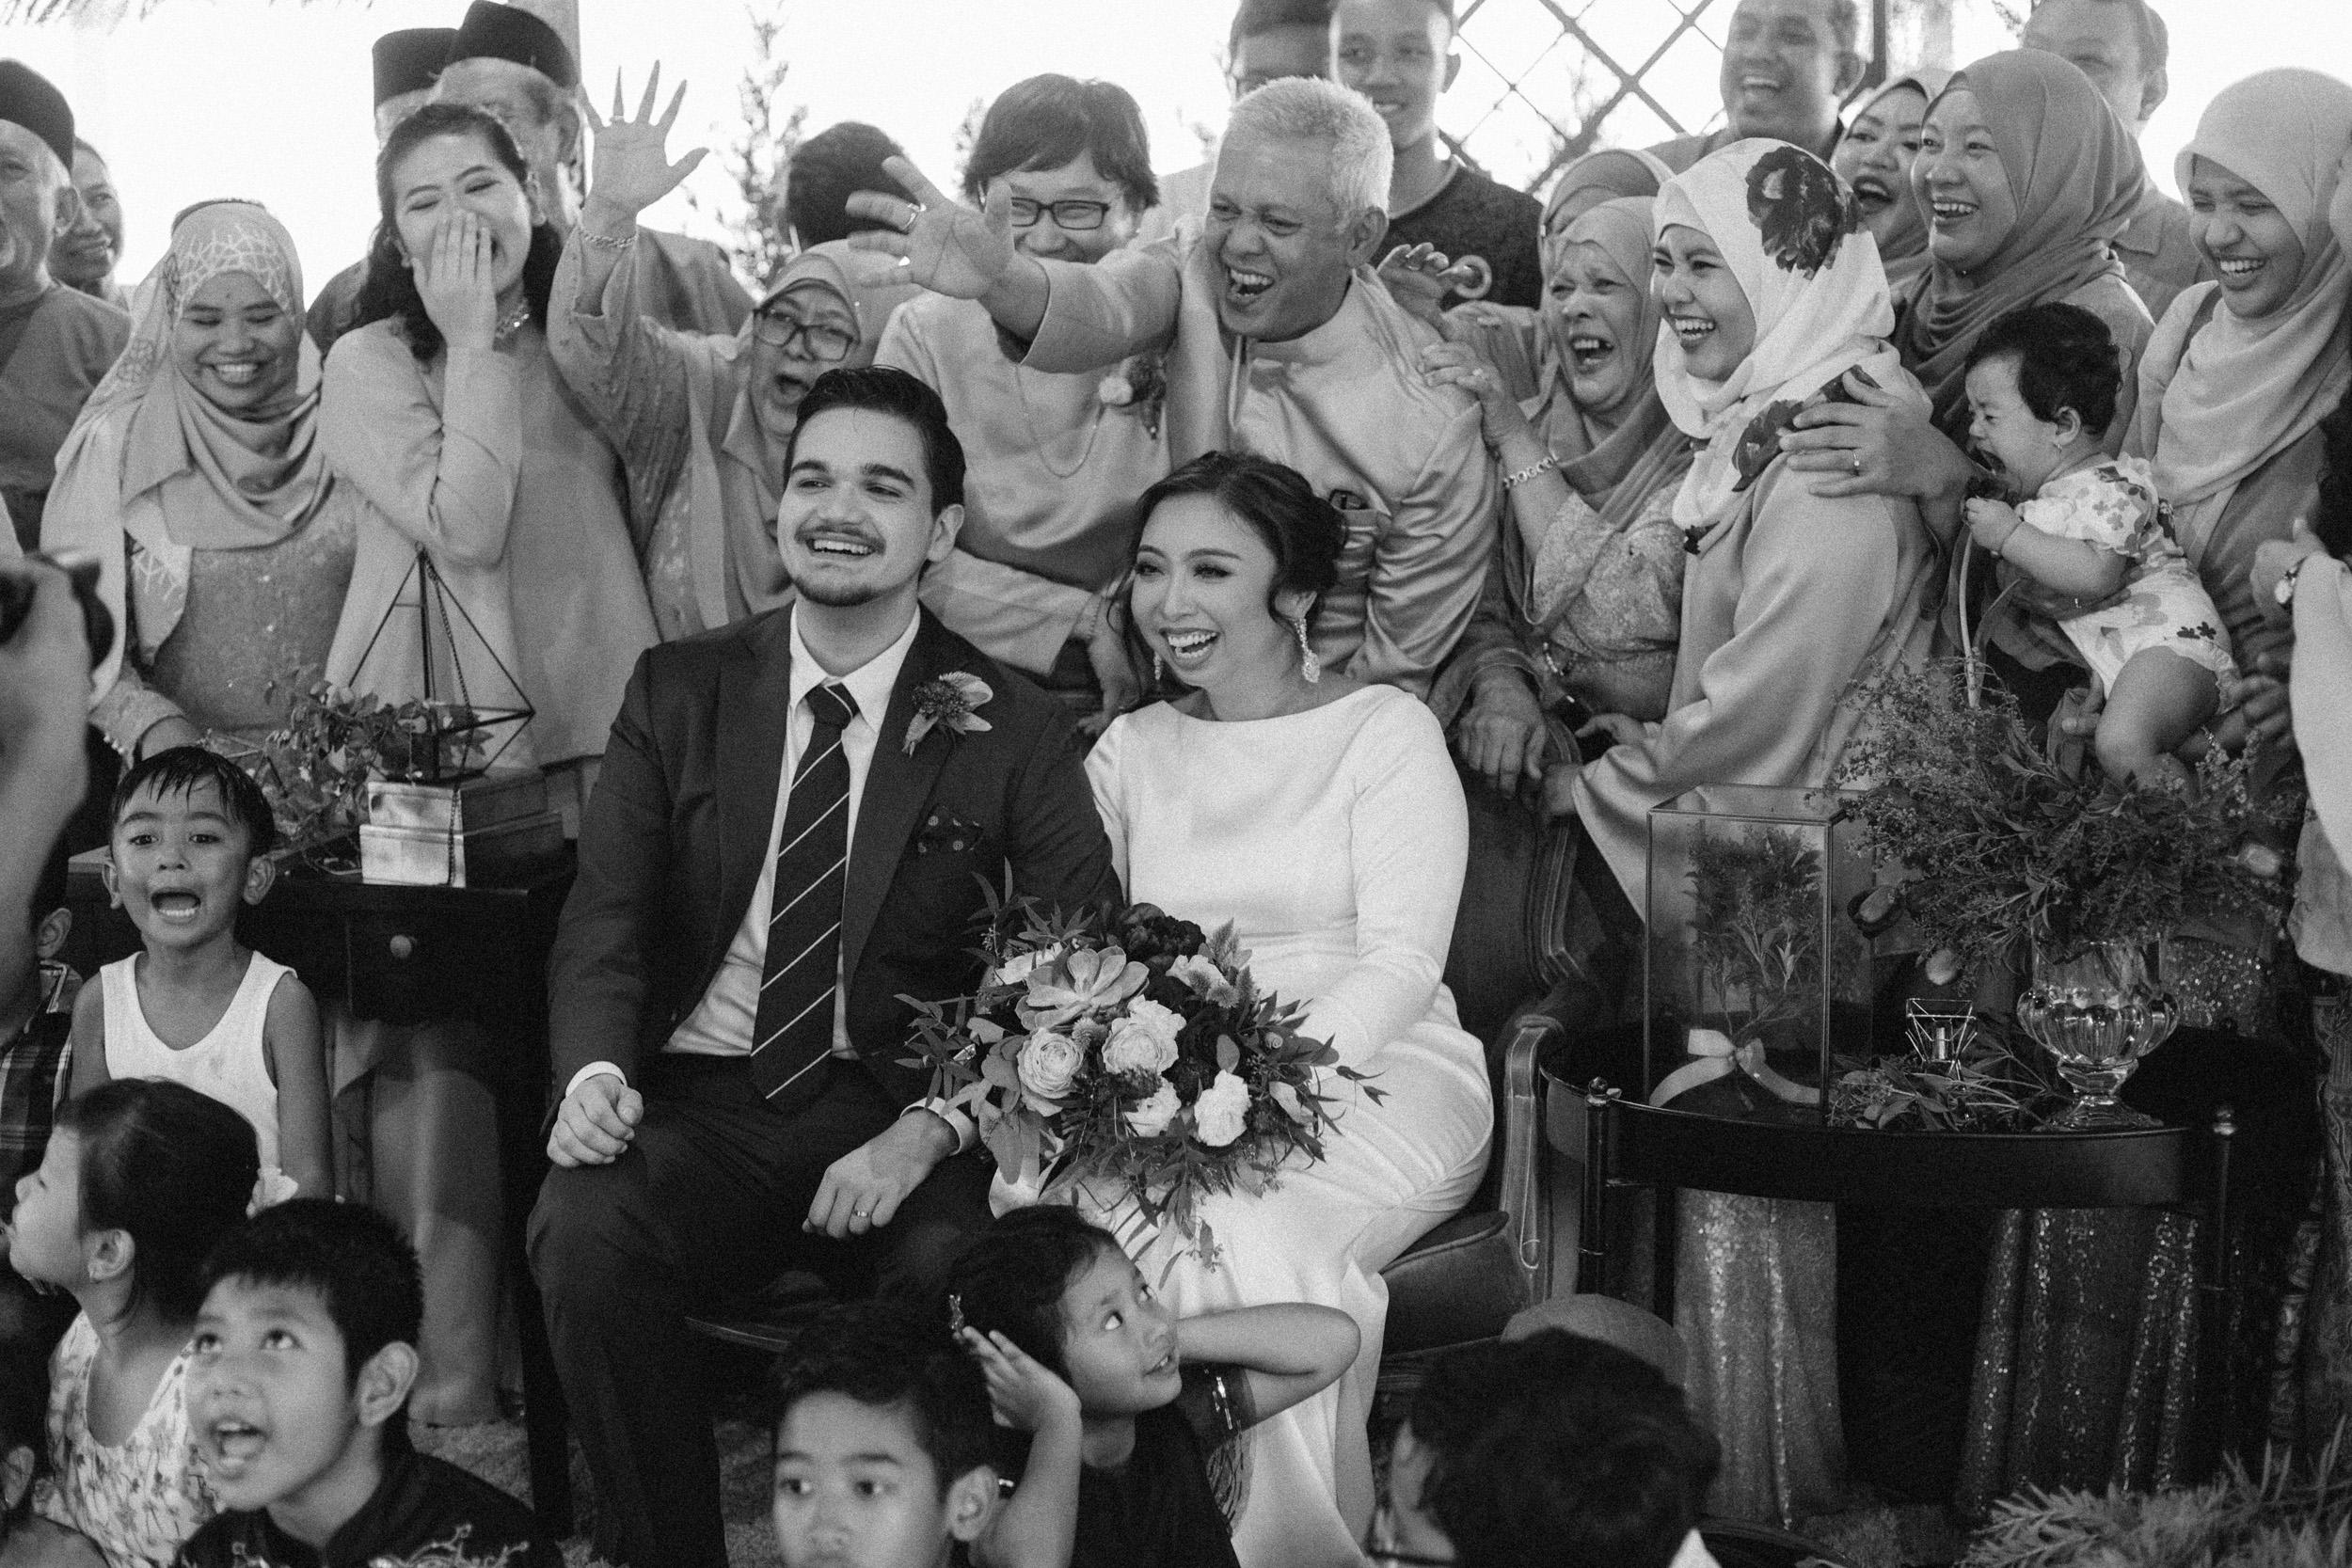 singapore-wedding-photographer-photography-wmt2017-124.jpg